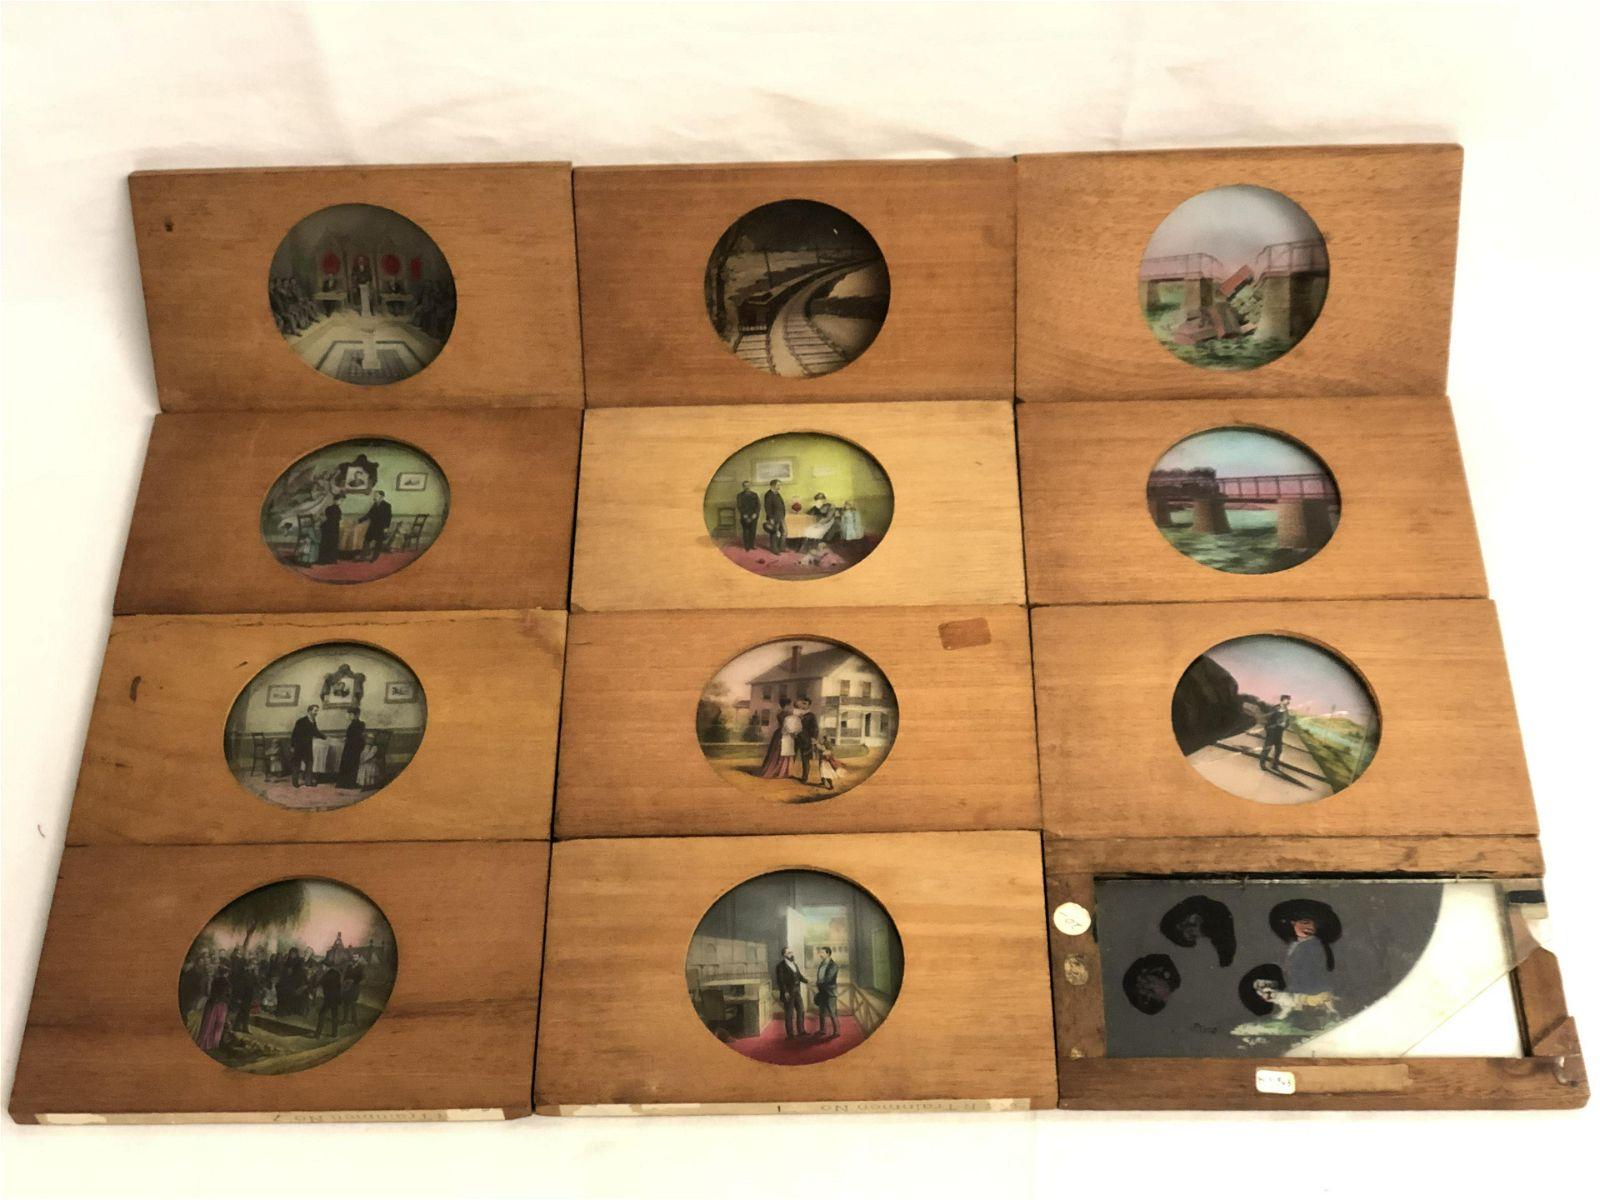 Atq M.C. Lilley Glass Painted Lantern Slides - (11)Asst